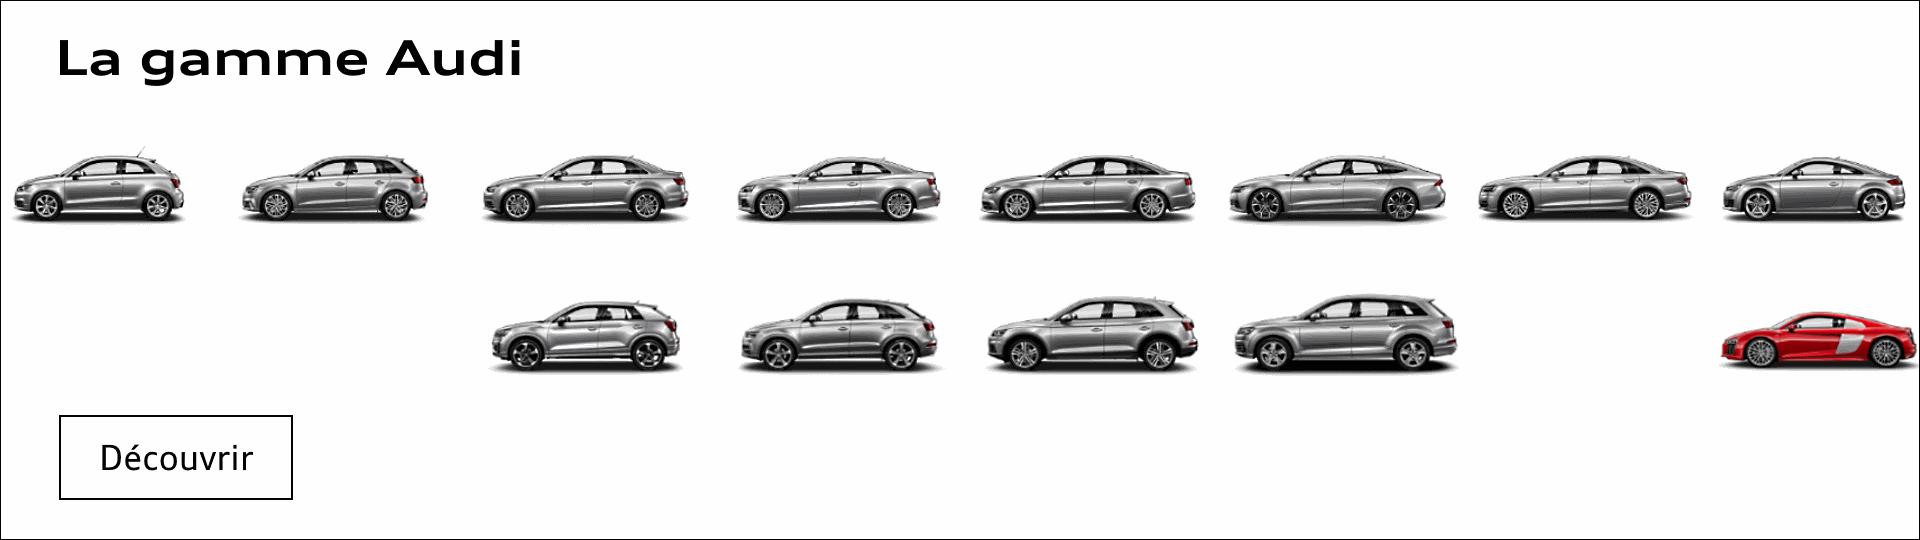 Modèles Audi > A1 A3 A4 A5 A6 A7 A8 Q2 Q3 Q5 Q7 TT